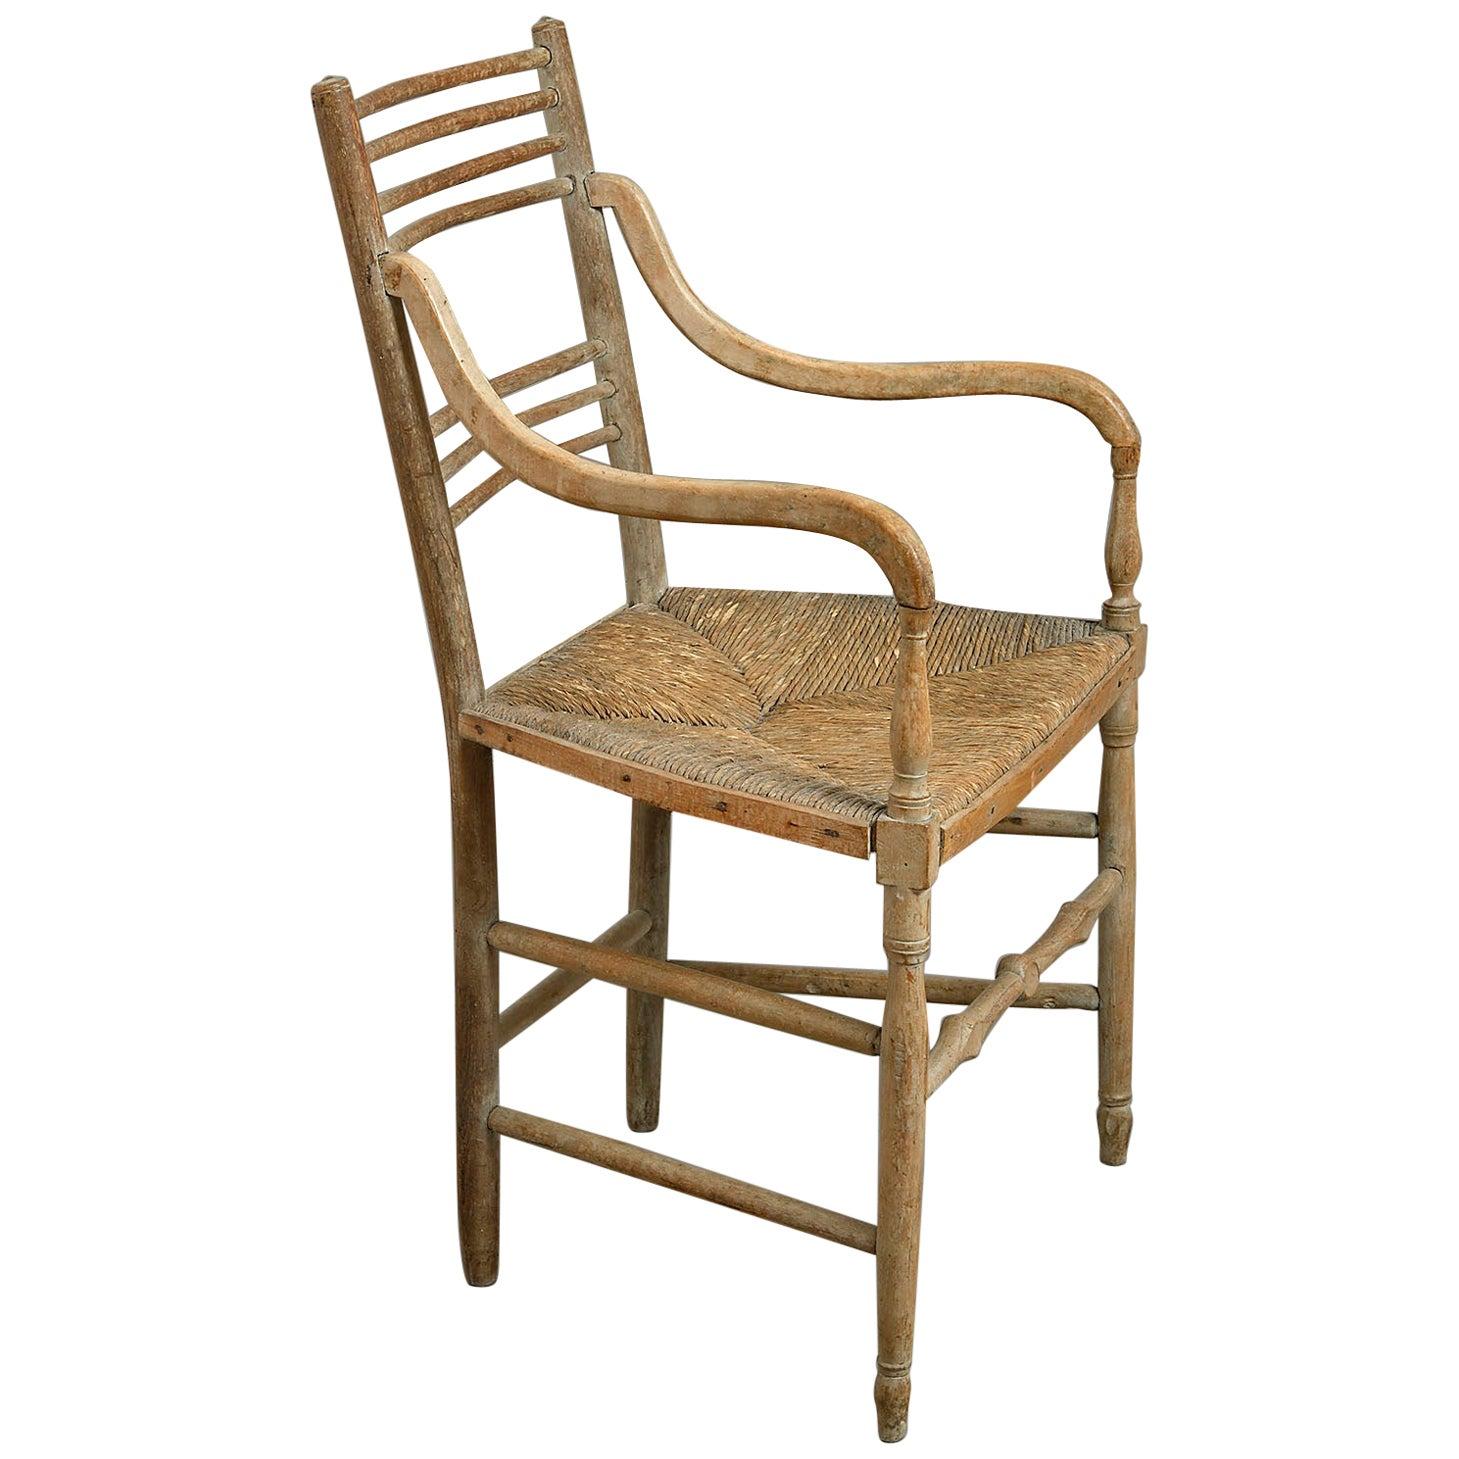 Early 19th Century Regency Rush-Seated Armchair